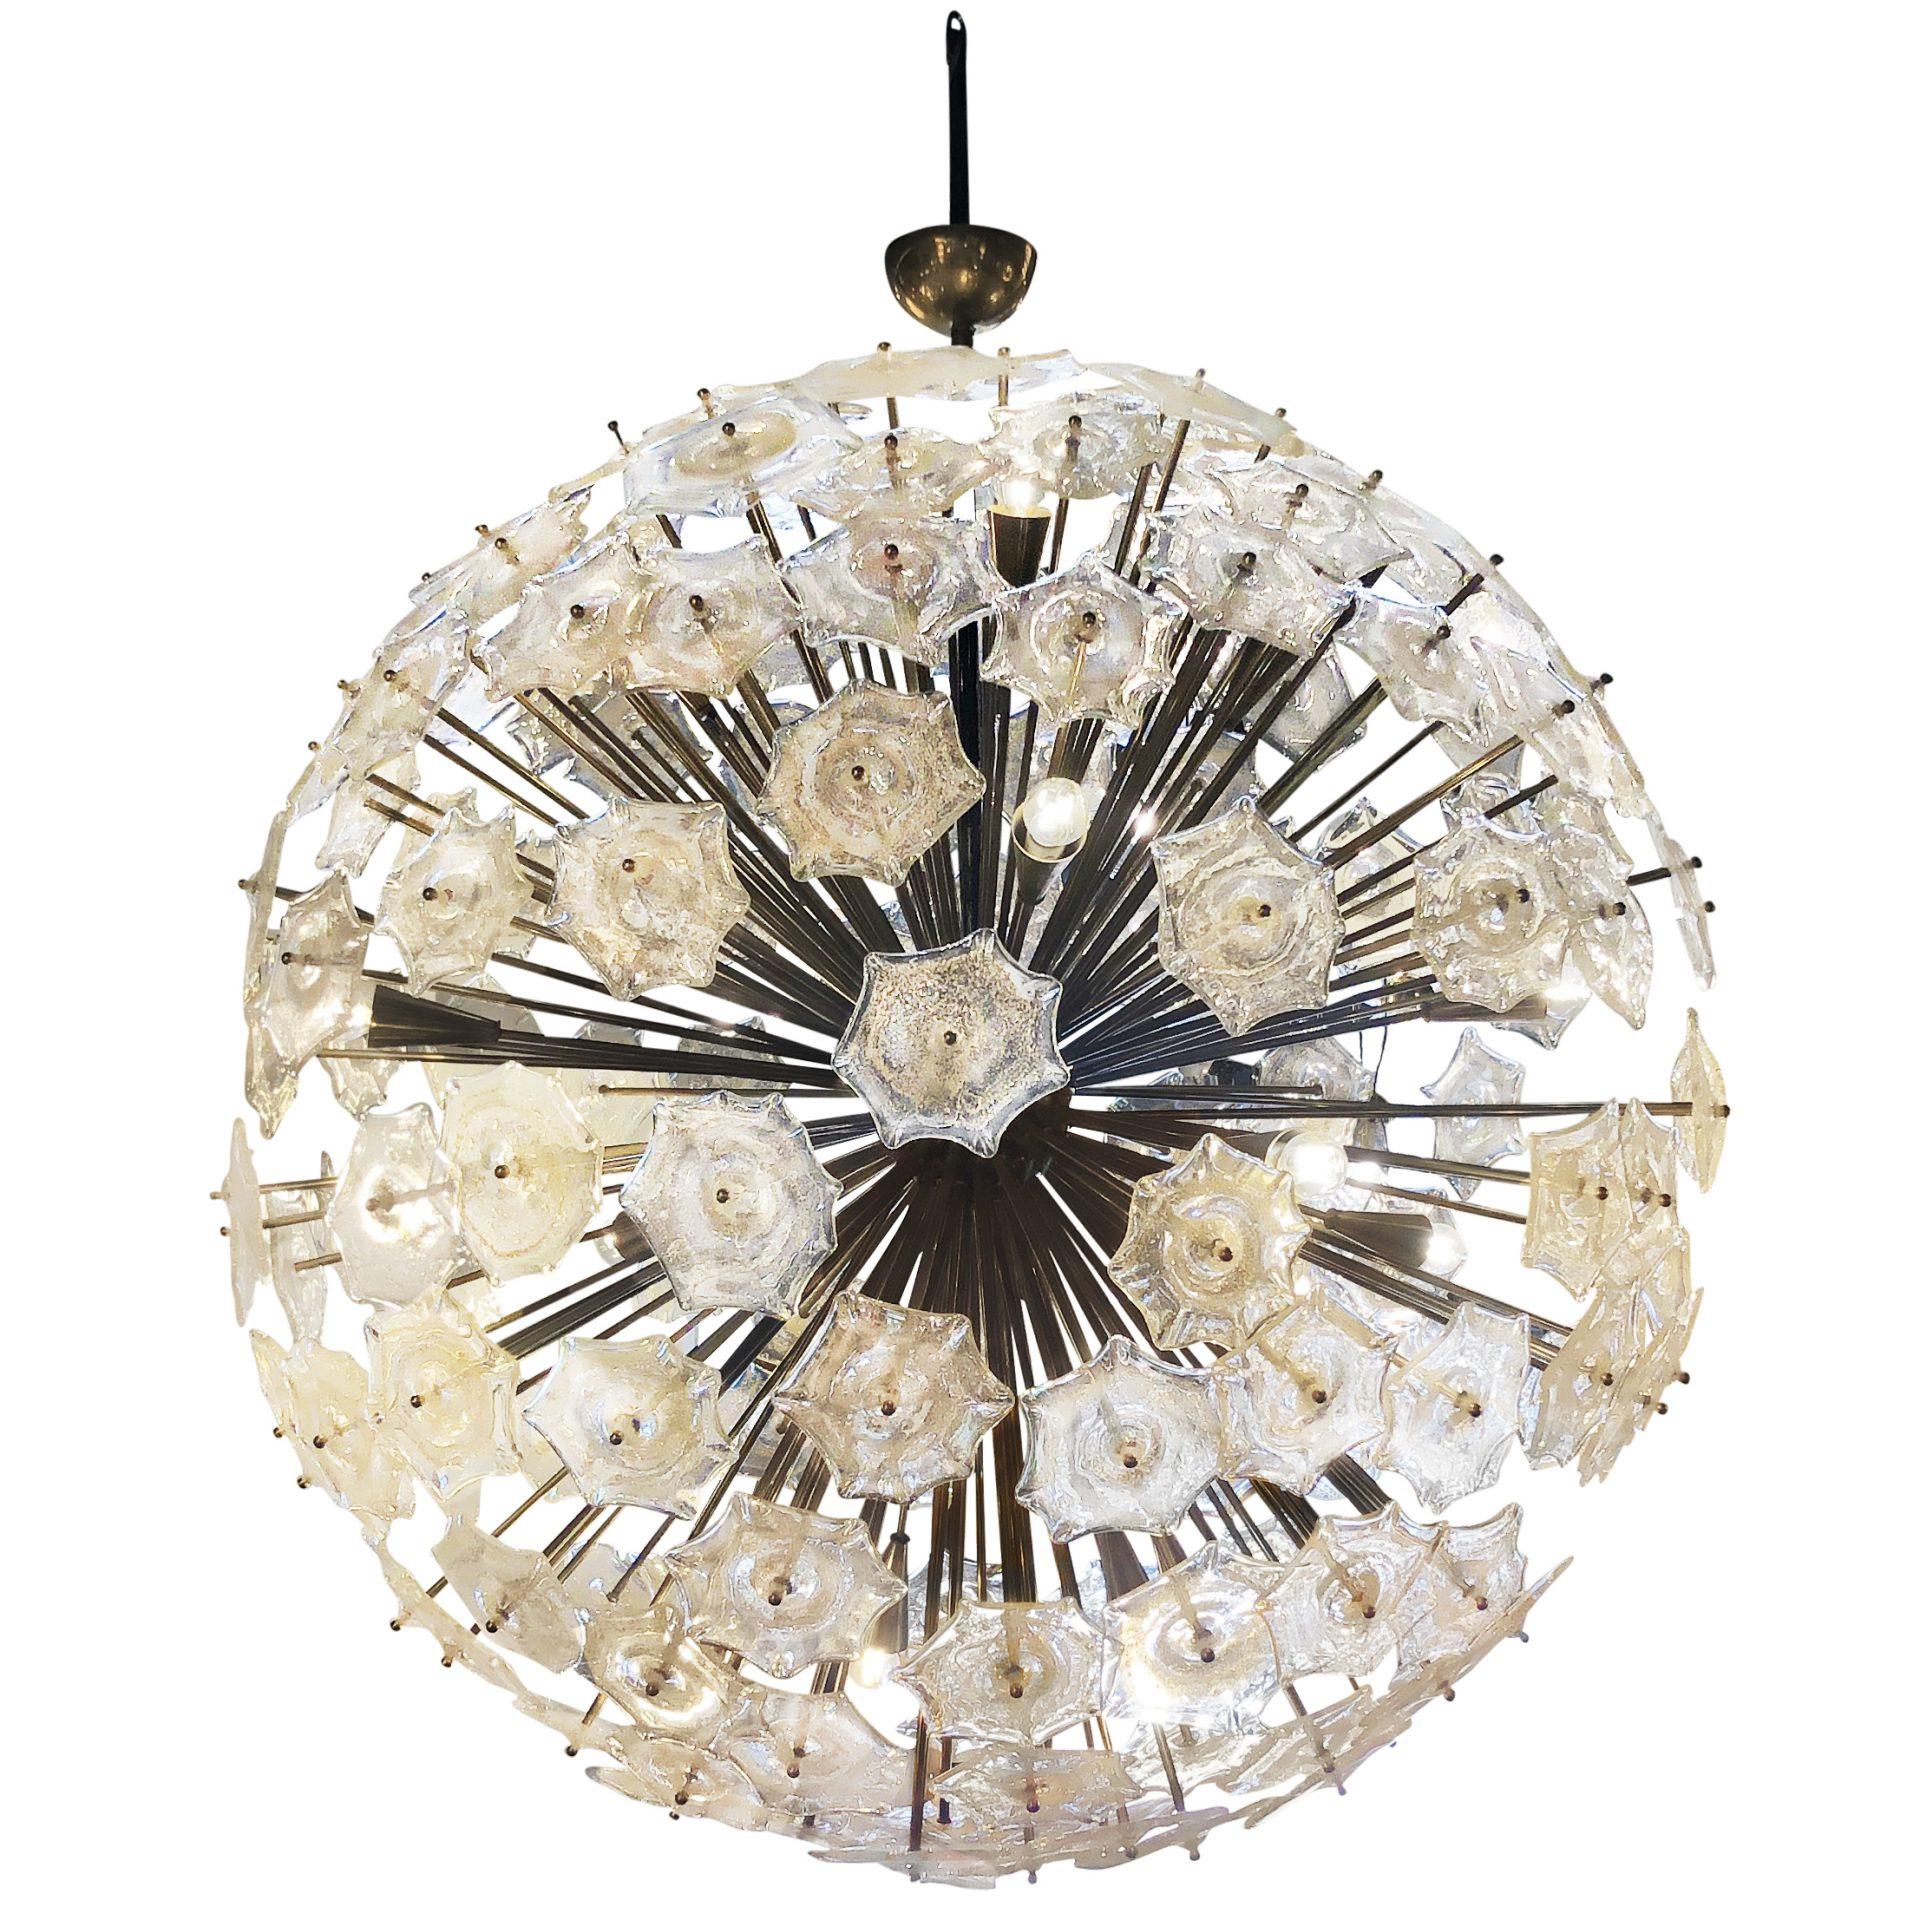 Mid-Century modern Italian chandelier of round shape with octagonal heavy Murano glass elements and 12 light sockets. Circa 1958 - 1960 Murano, Italy